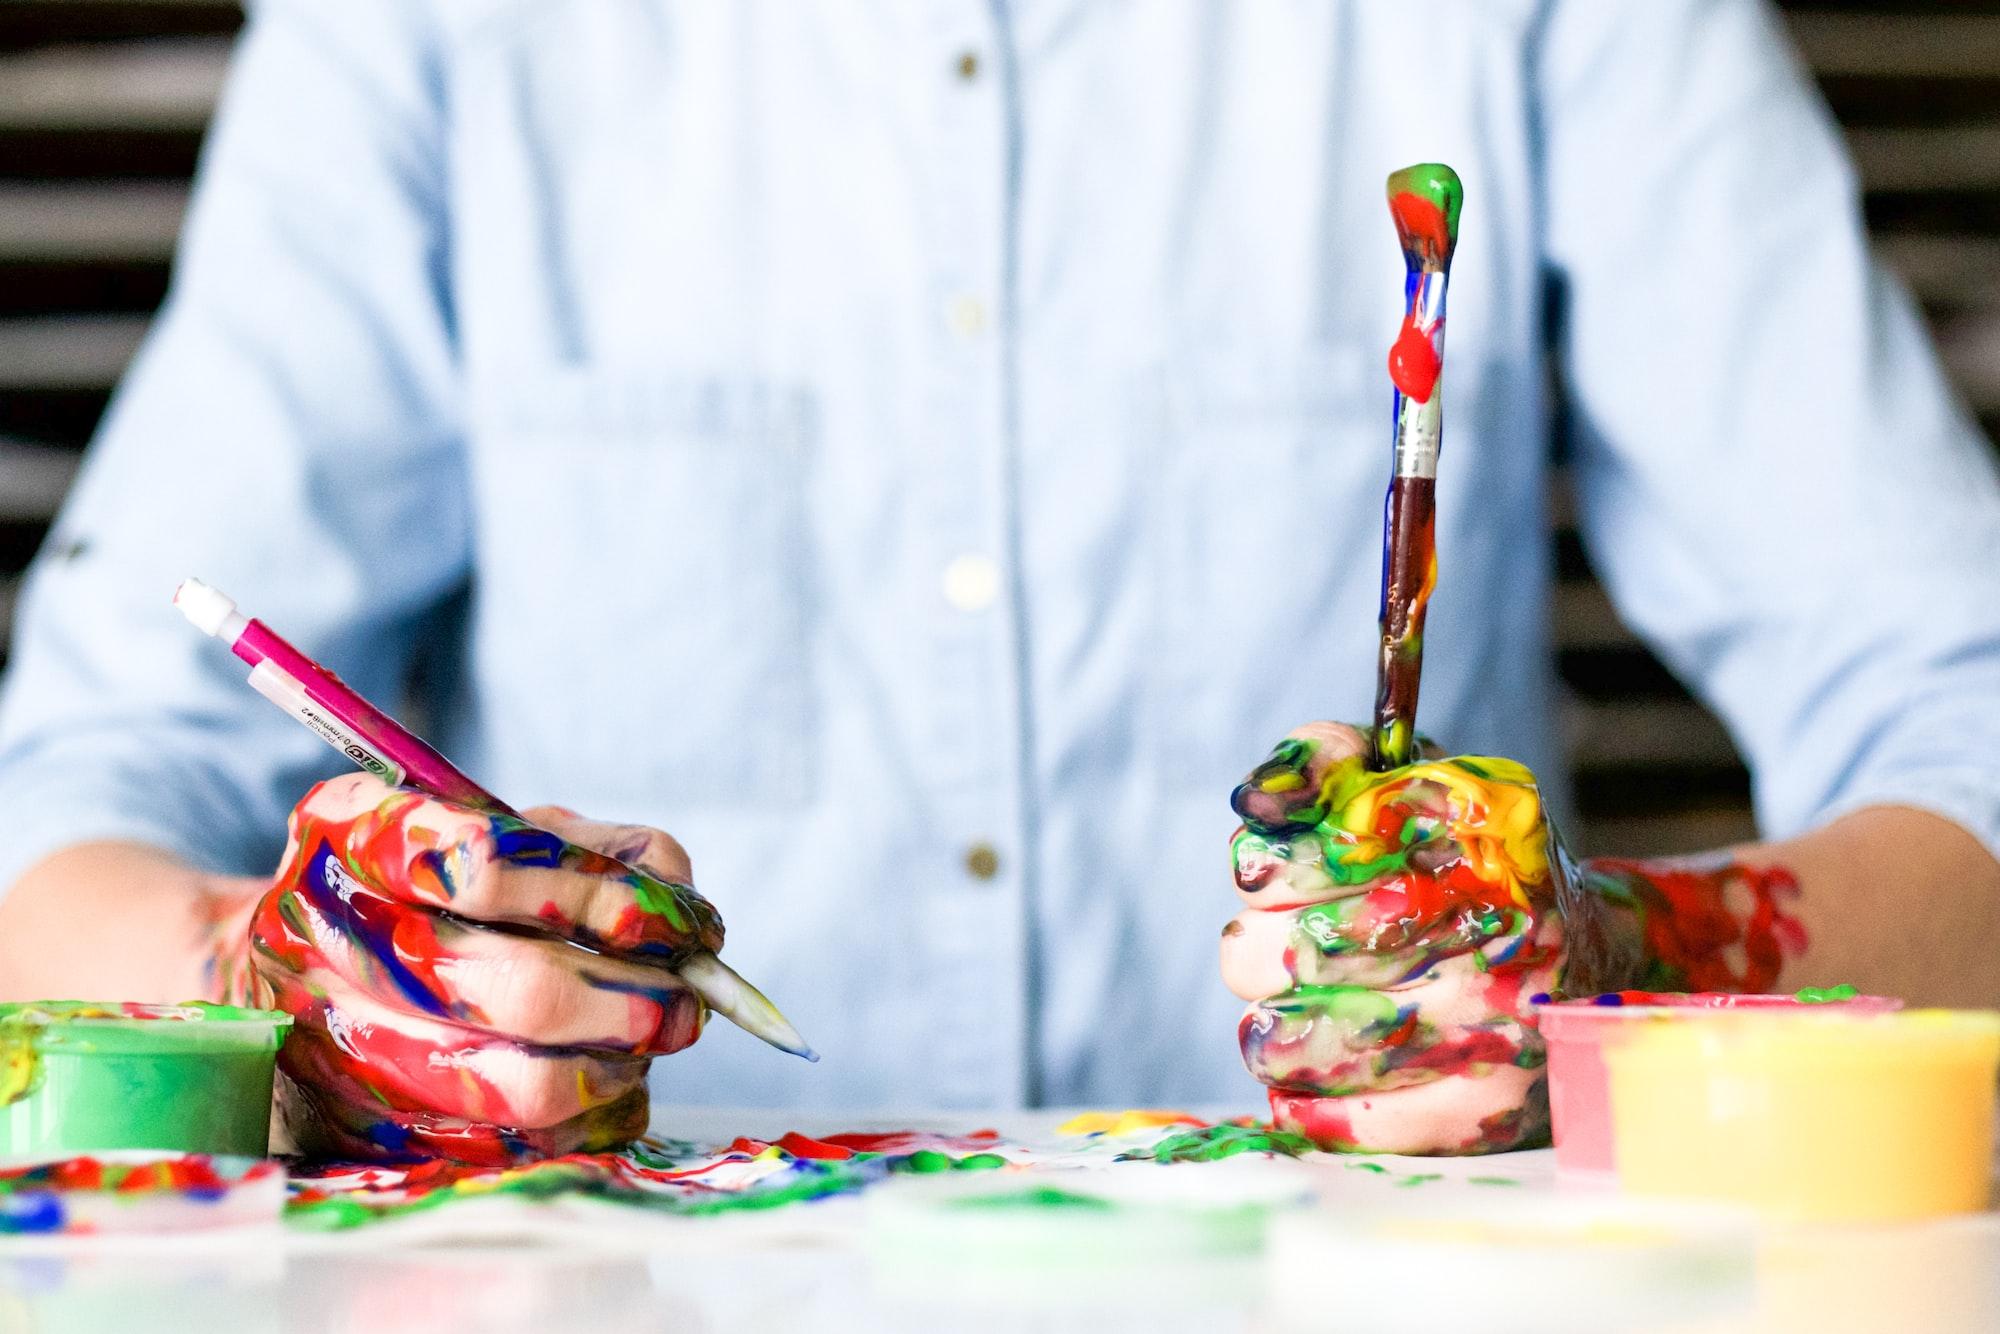 A Picture Paints a Thousand Words